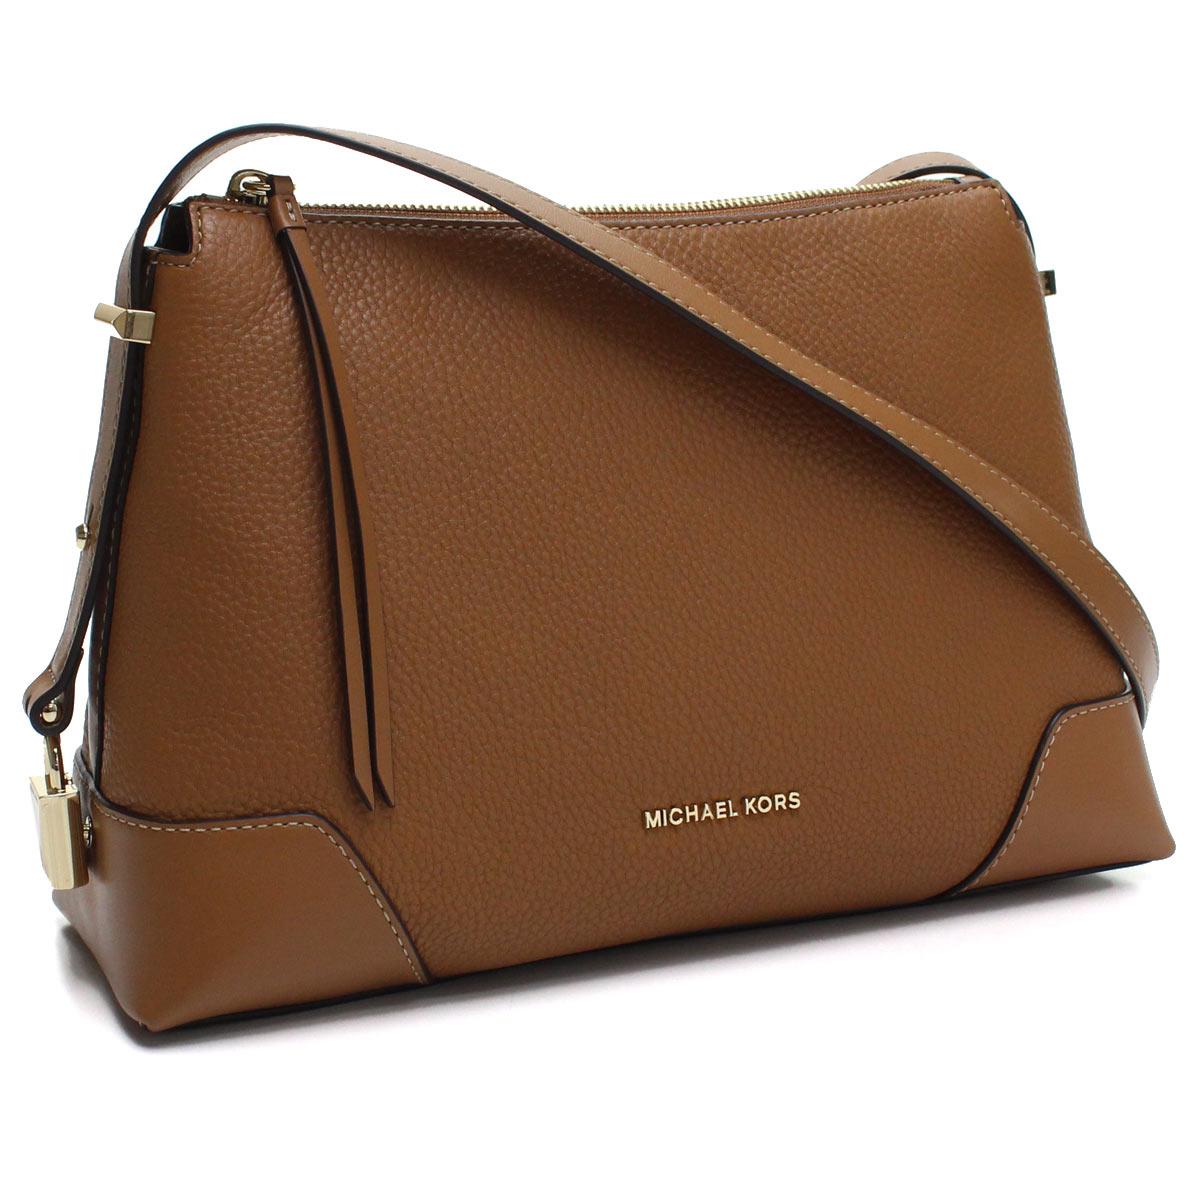 b3d0050b715c Bighit The total brand wholesale  Take Michael Kors MICHAEL KORS CROSBY  slant  shoulder bag 30H8GCBM2L 203 ACORN brown system